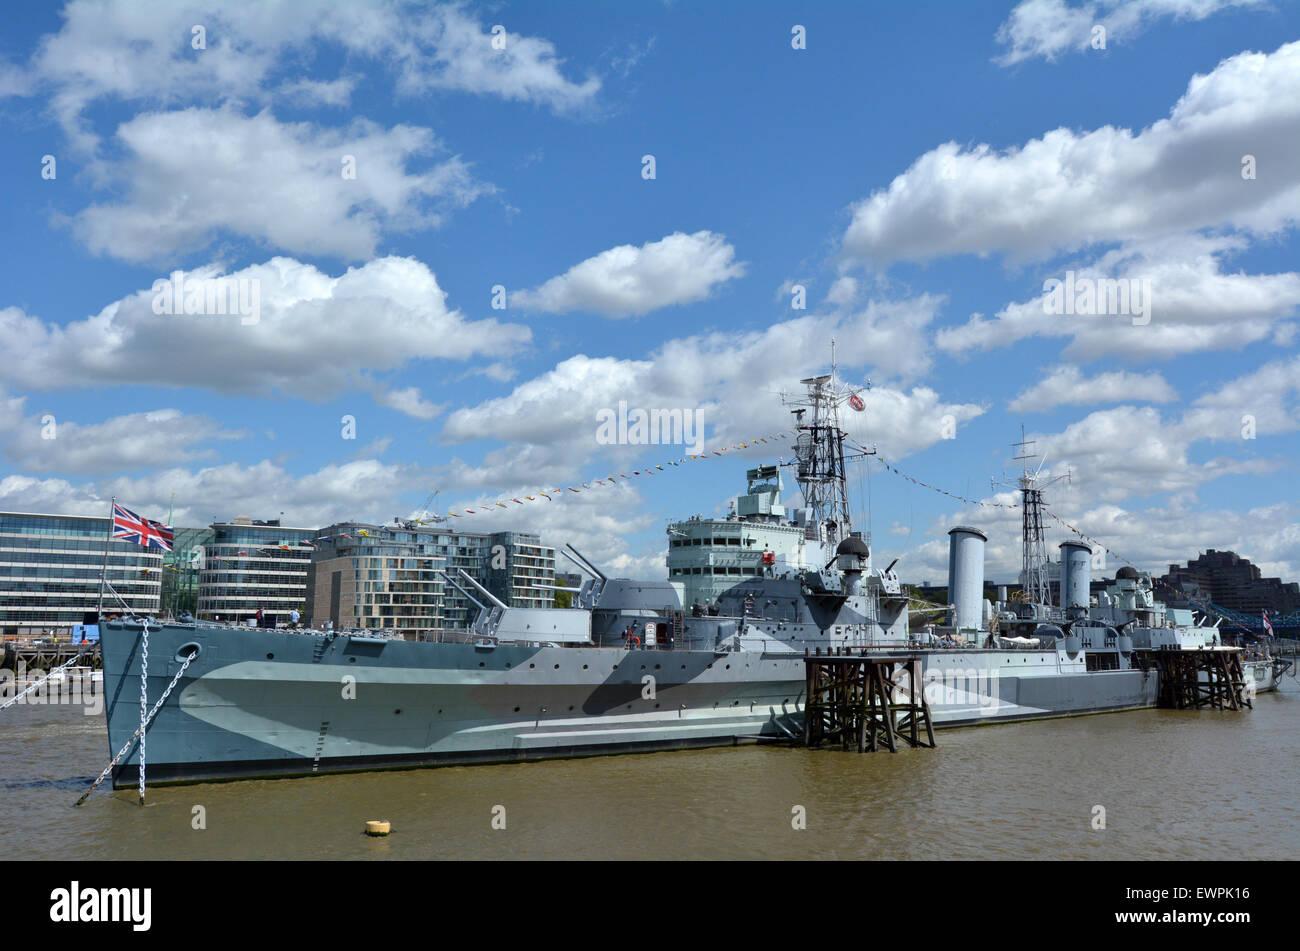 LONDON - MAY 13 2015:HMS Belfast (C35) London England UK.It's a museum ship, originally a Royal Navy light cruiser, - Stock Image